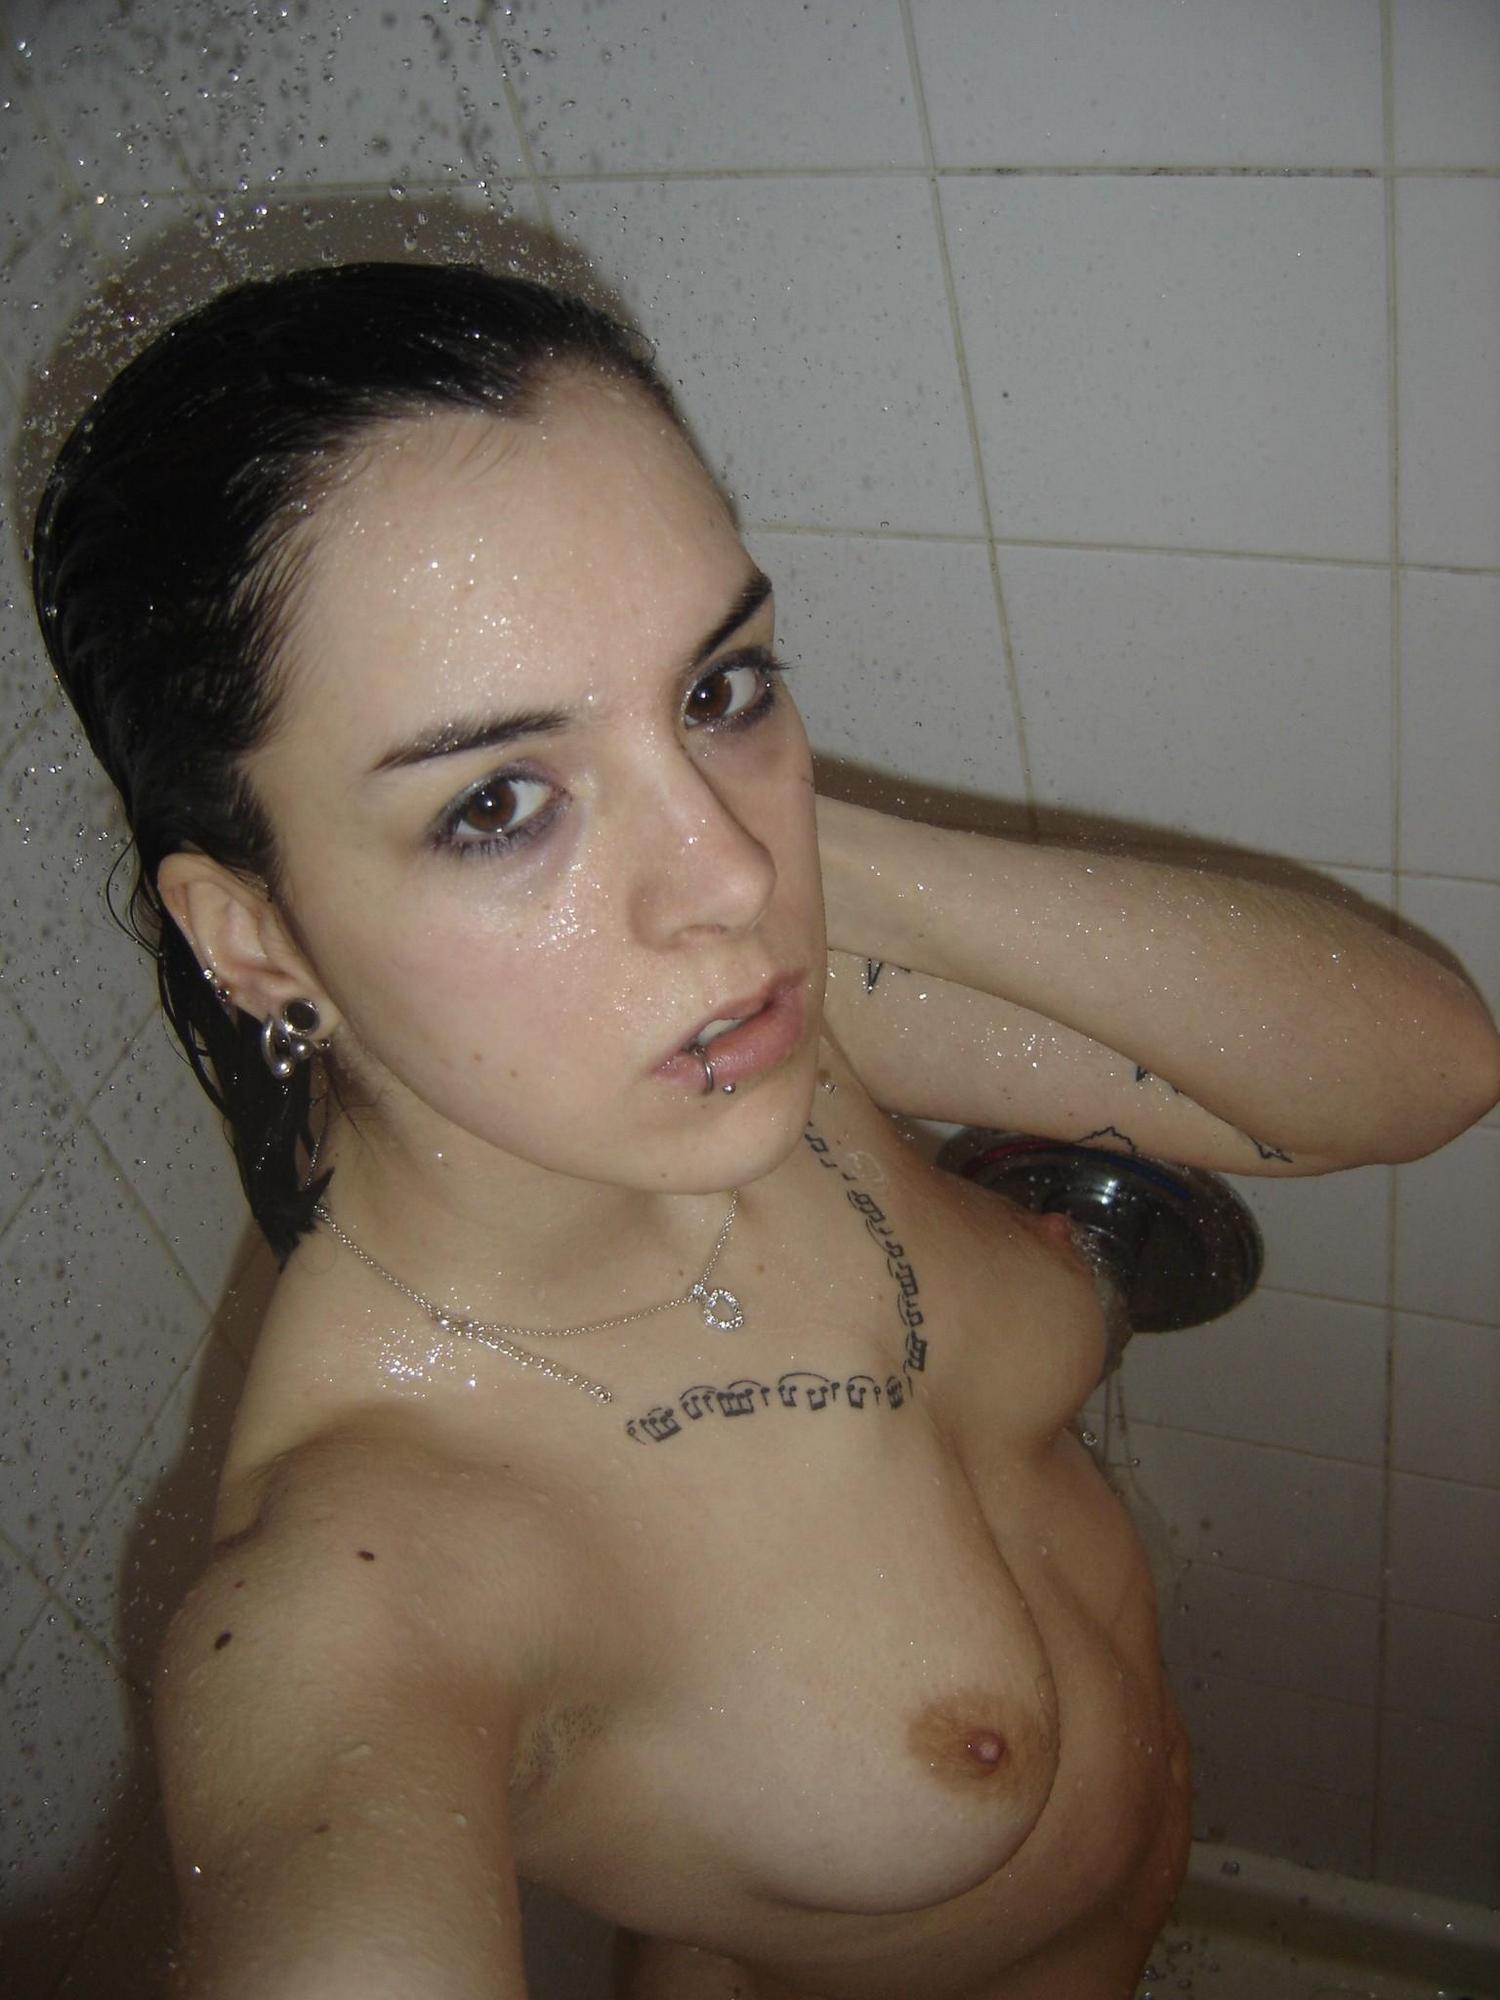 Красавица с татуировками на теле на кухне делает ню селфи секс фото